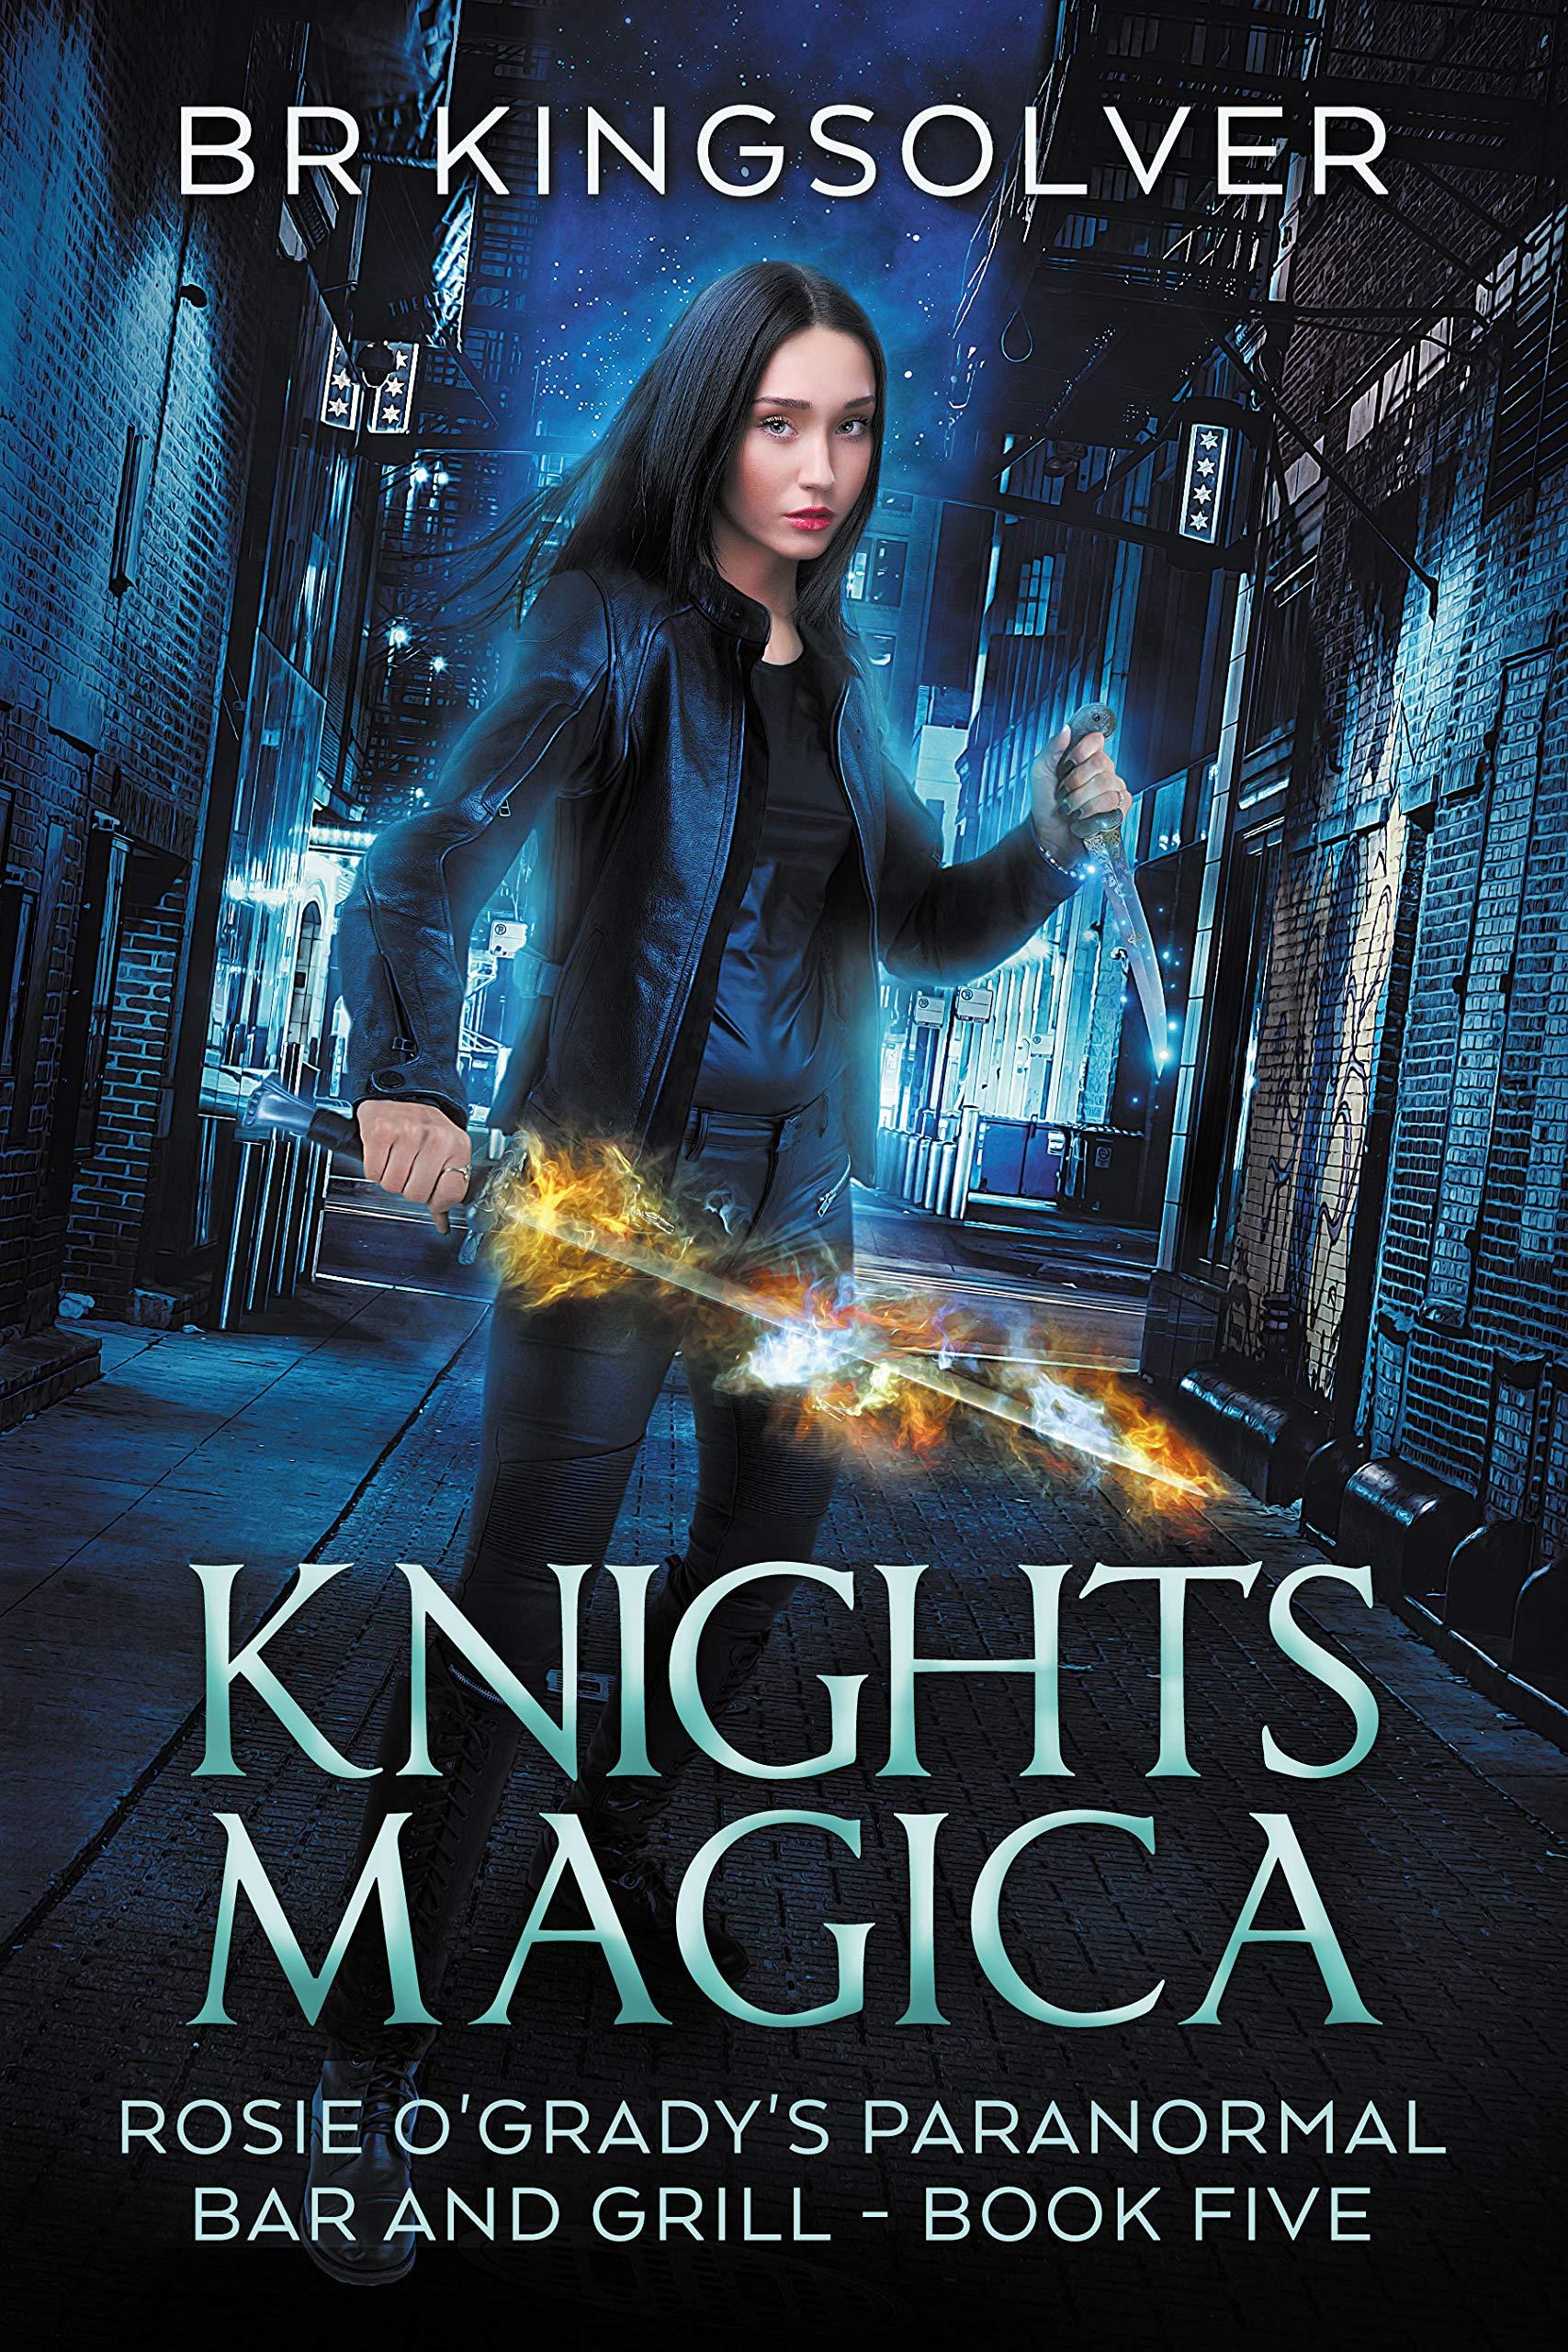 Knights Magica: An Urban Fantasy (Rosie O'Grady's Paranormal Bar and Grill Book 5)